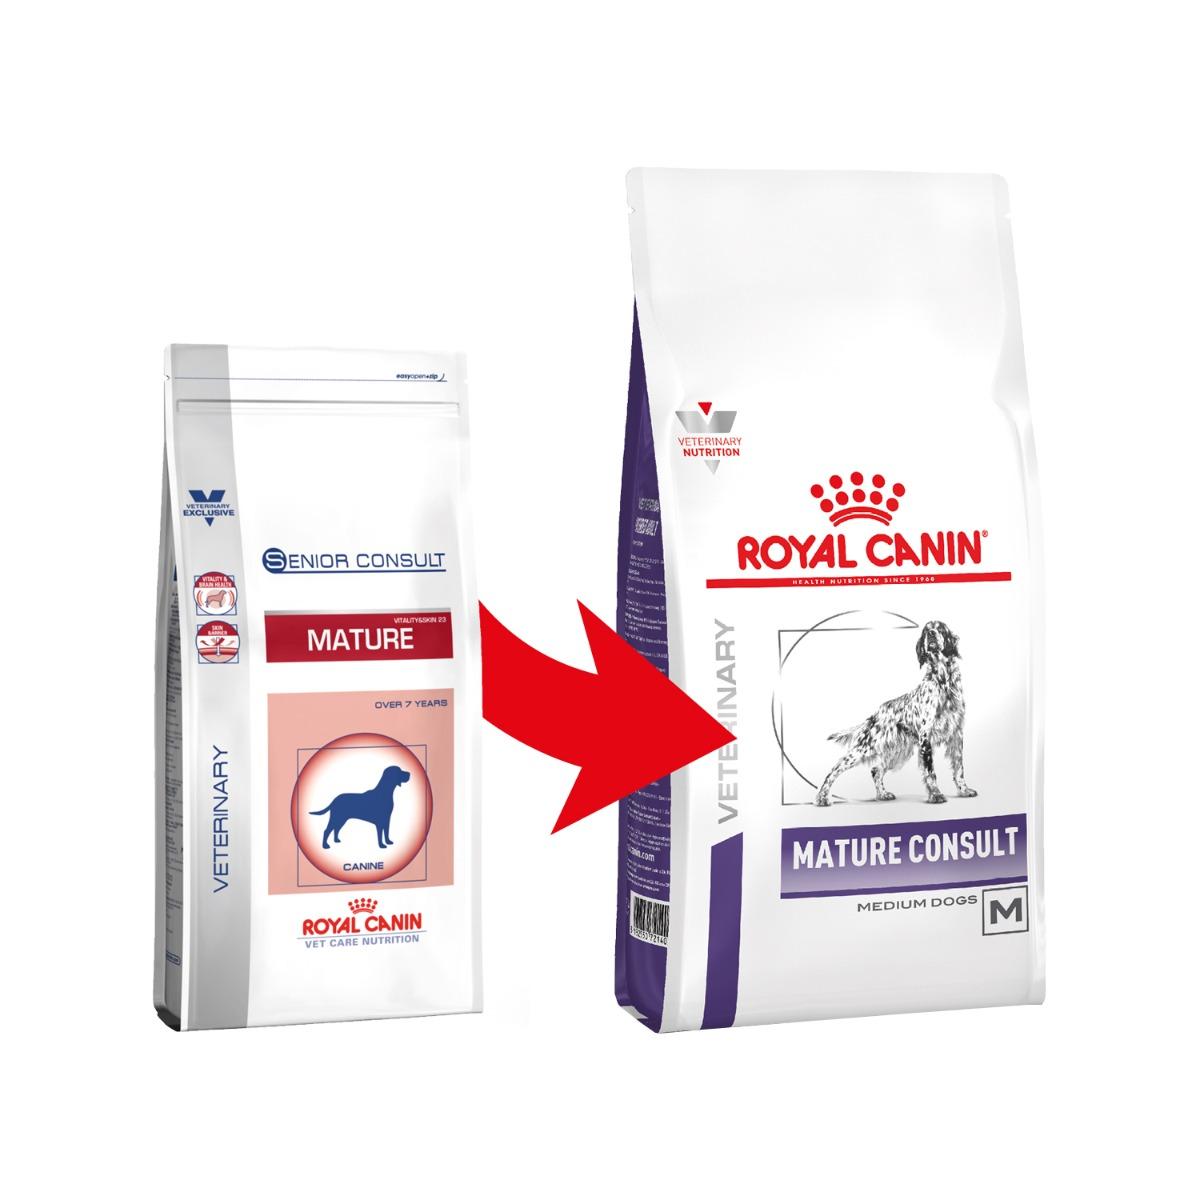 Royal Canin VCN Senior Consult Mature Medium Dog Hundefutter